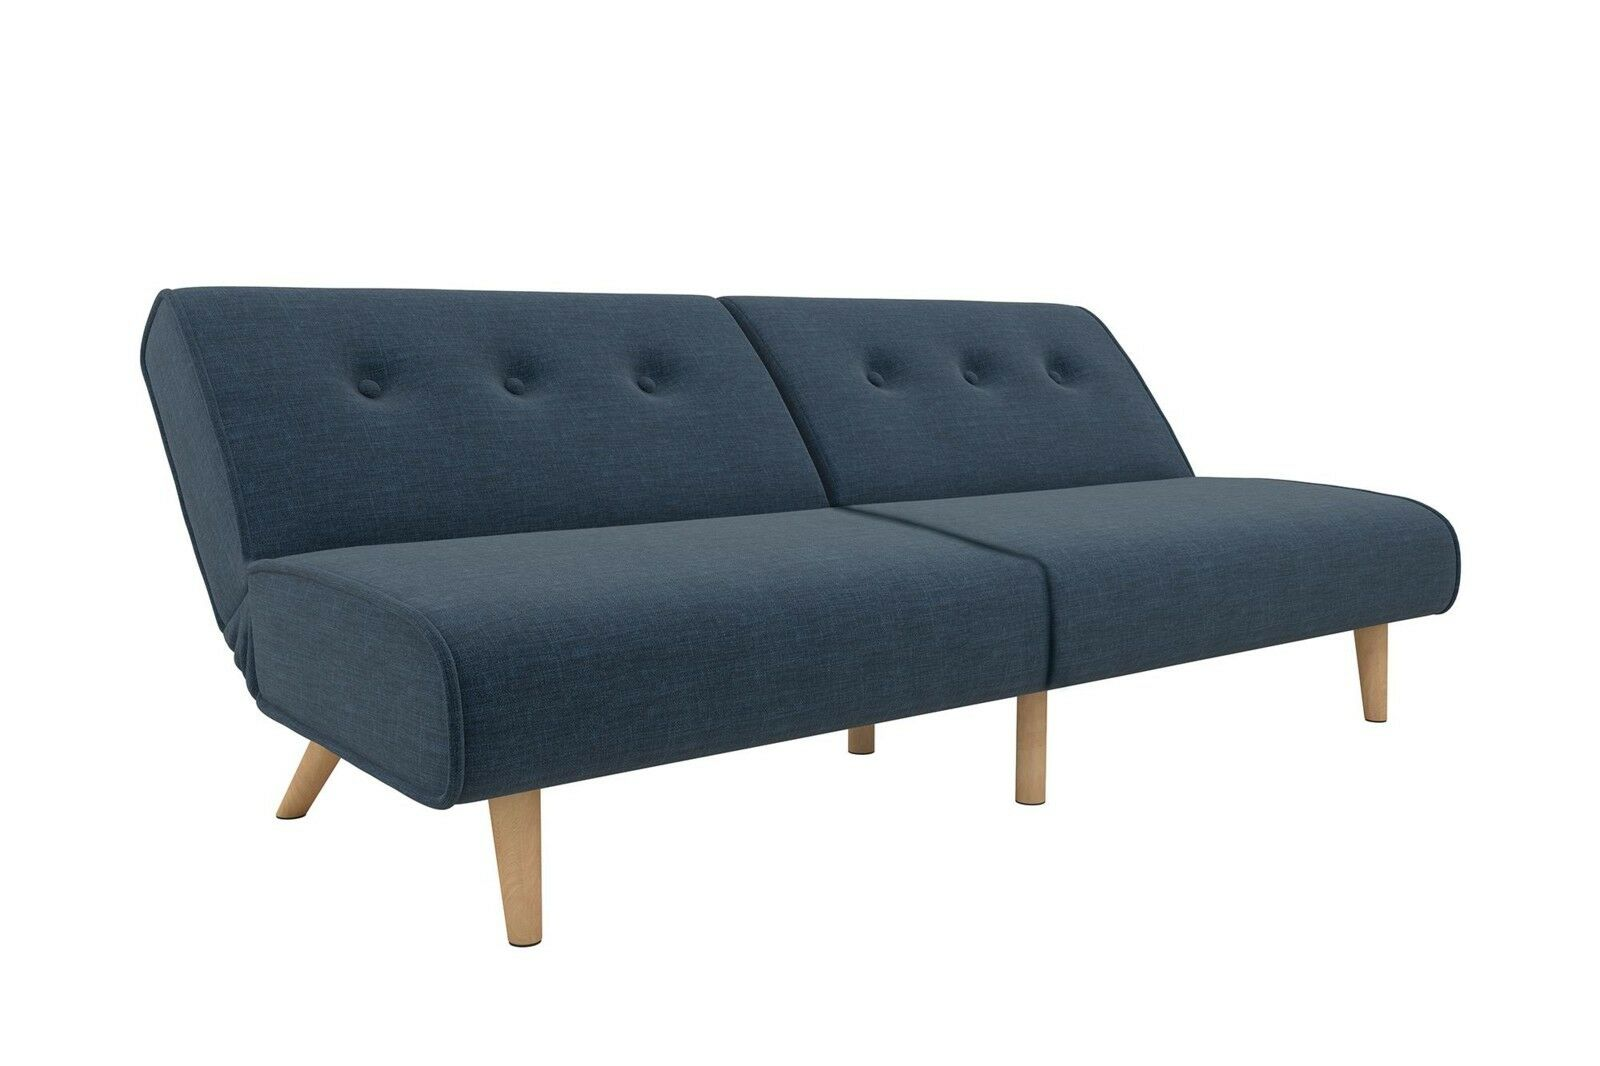 Novogratz Palm Springs Convertible Sofa Sleeper in Rich Line